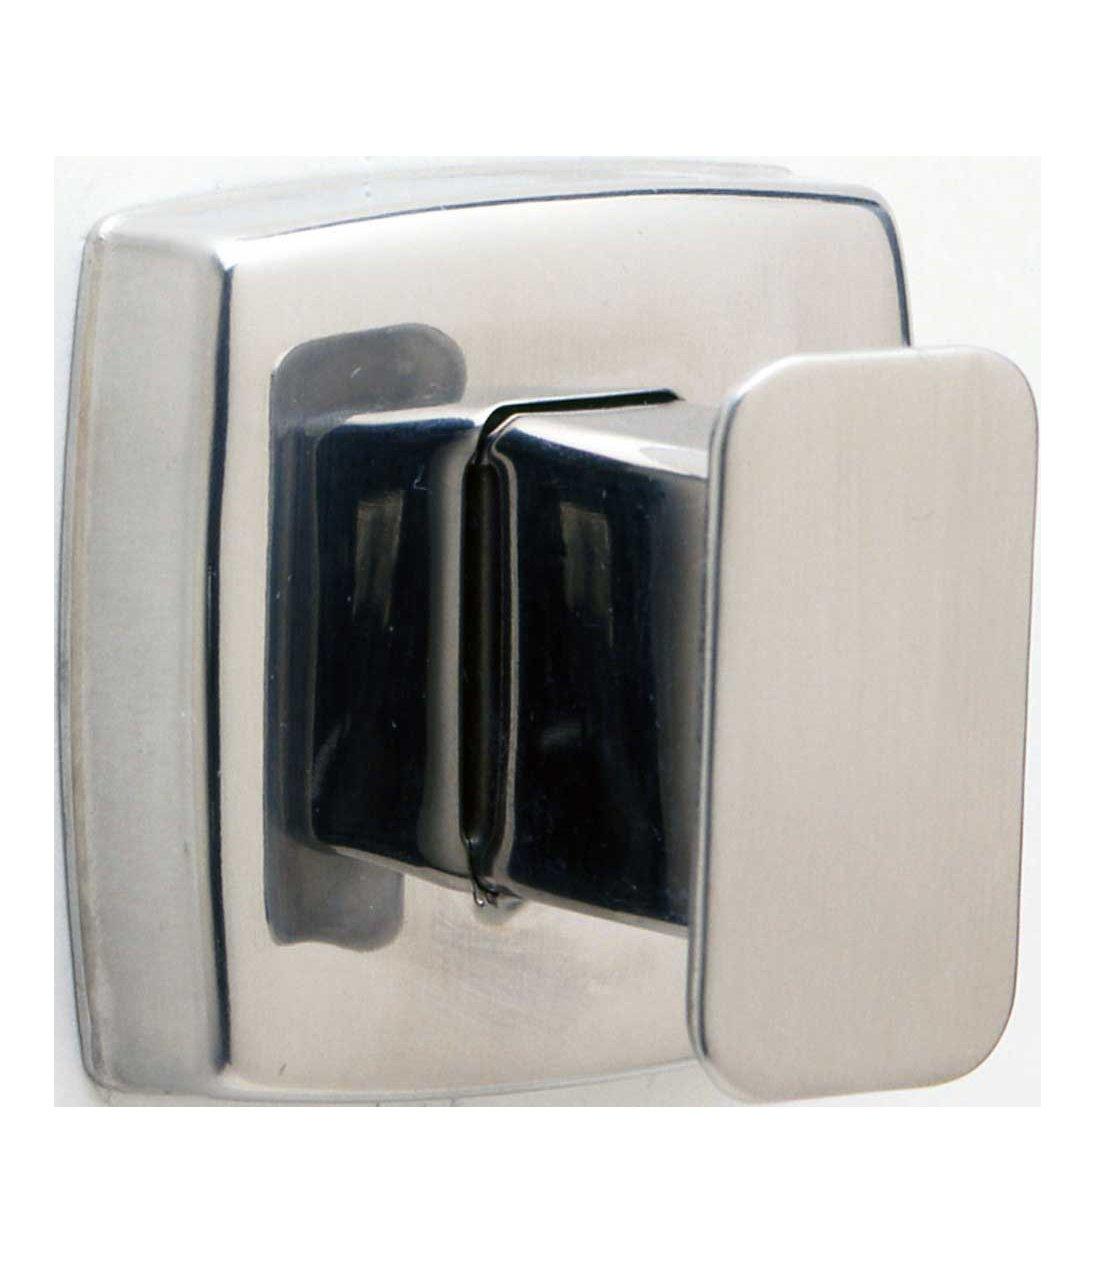 Bobrick 76717 Stainless Steel Surface Mounted Single Robe Hook, Satin Finish, 1-3/16'' Width x 1-5/8'' Height